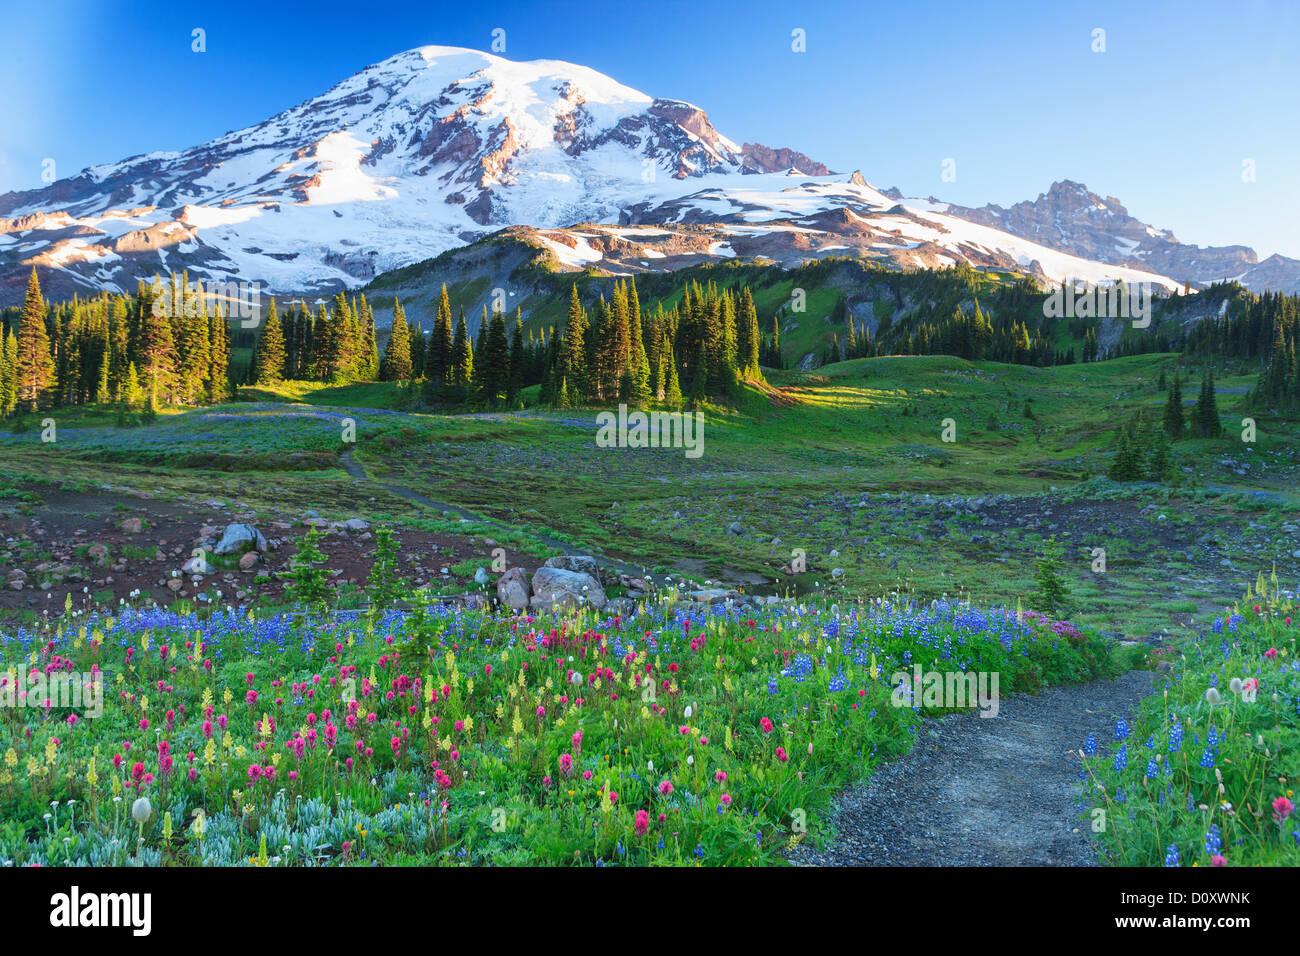 Summer alpine wild flower meadow, Mount Rainier National Park, Washington, USA - Stock Image